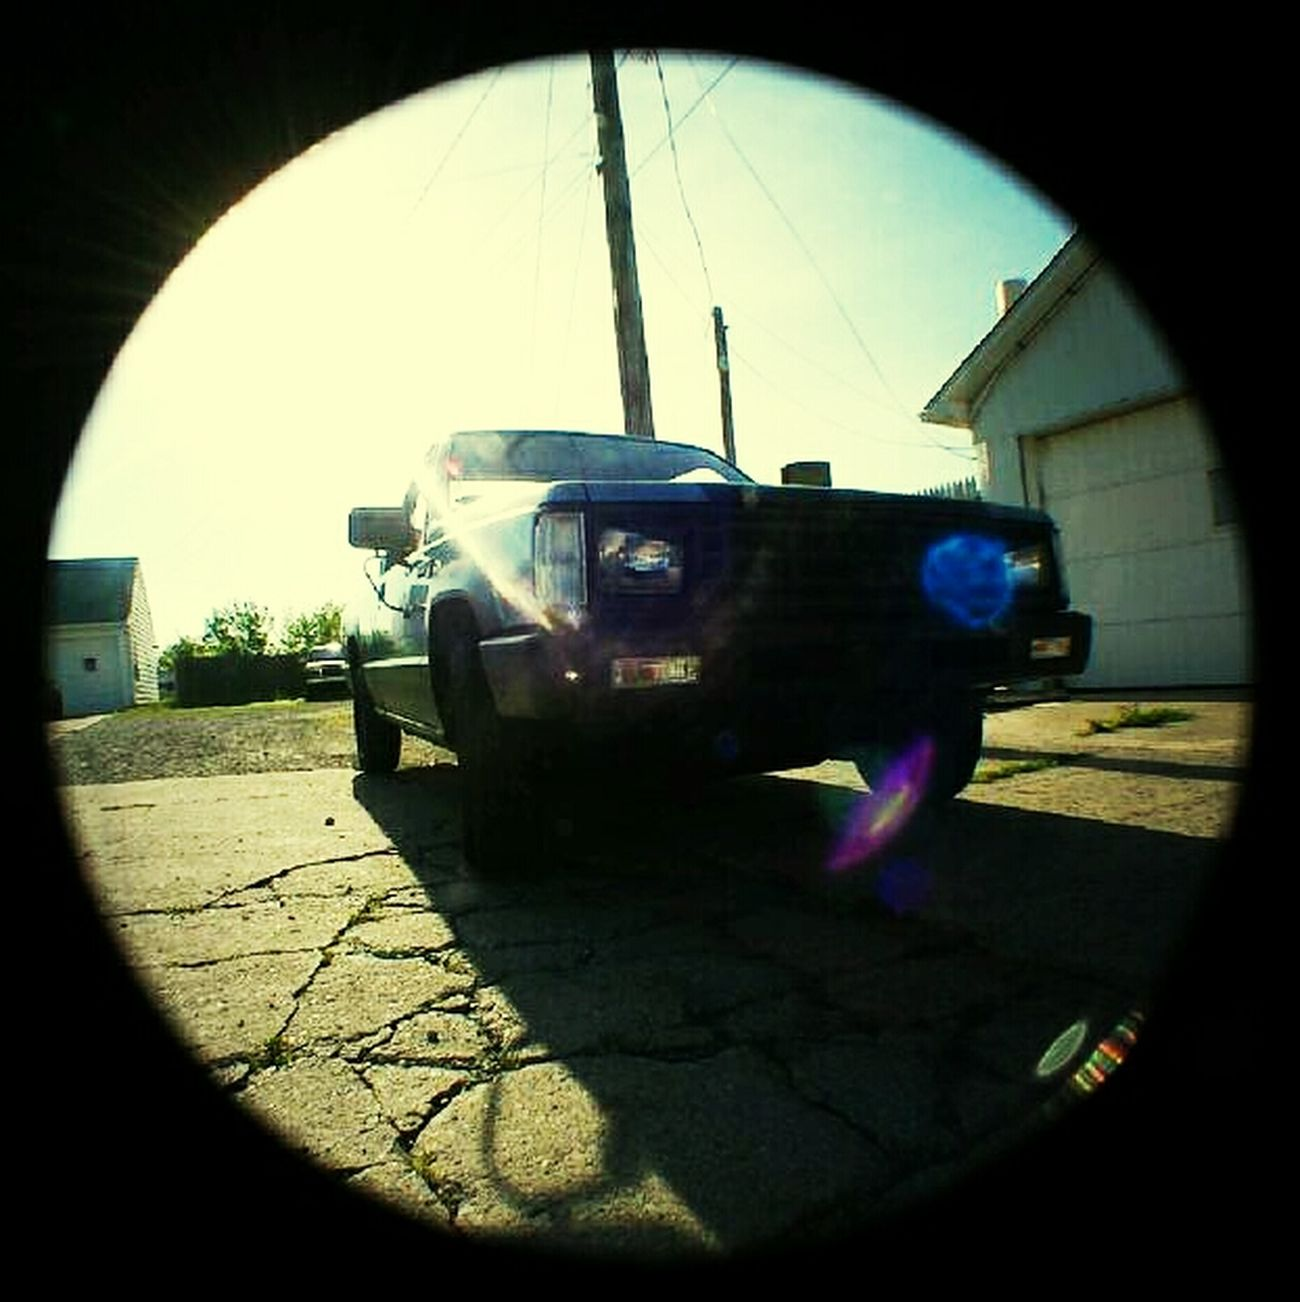 my truck 1988 Dodge Ram50 Dsm #4g63